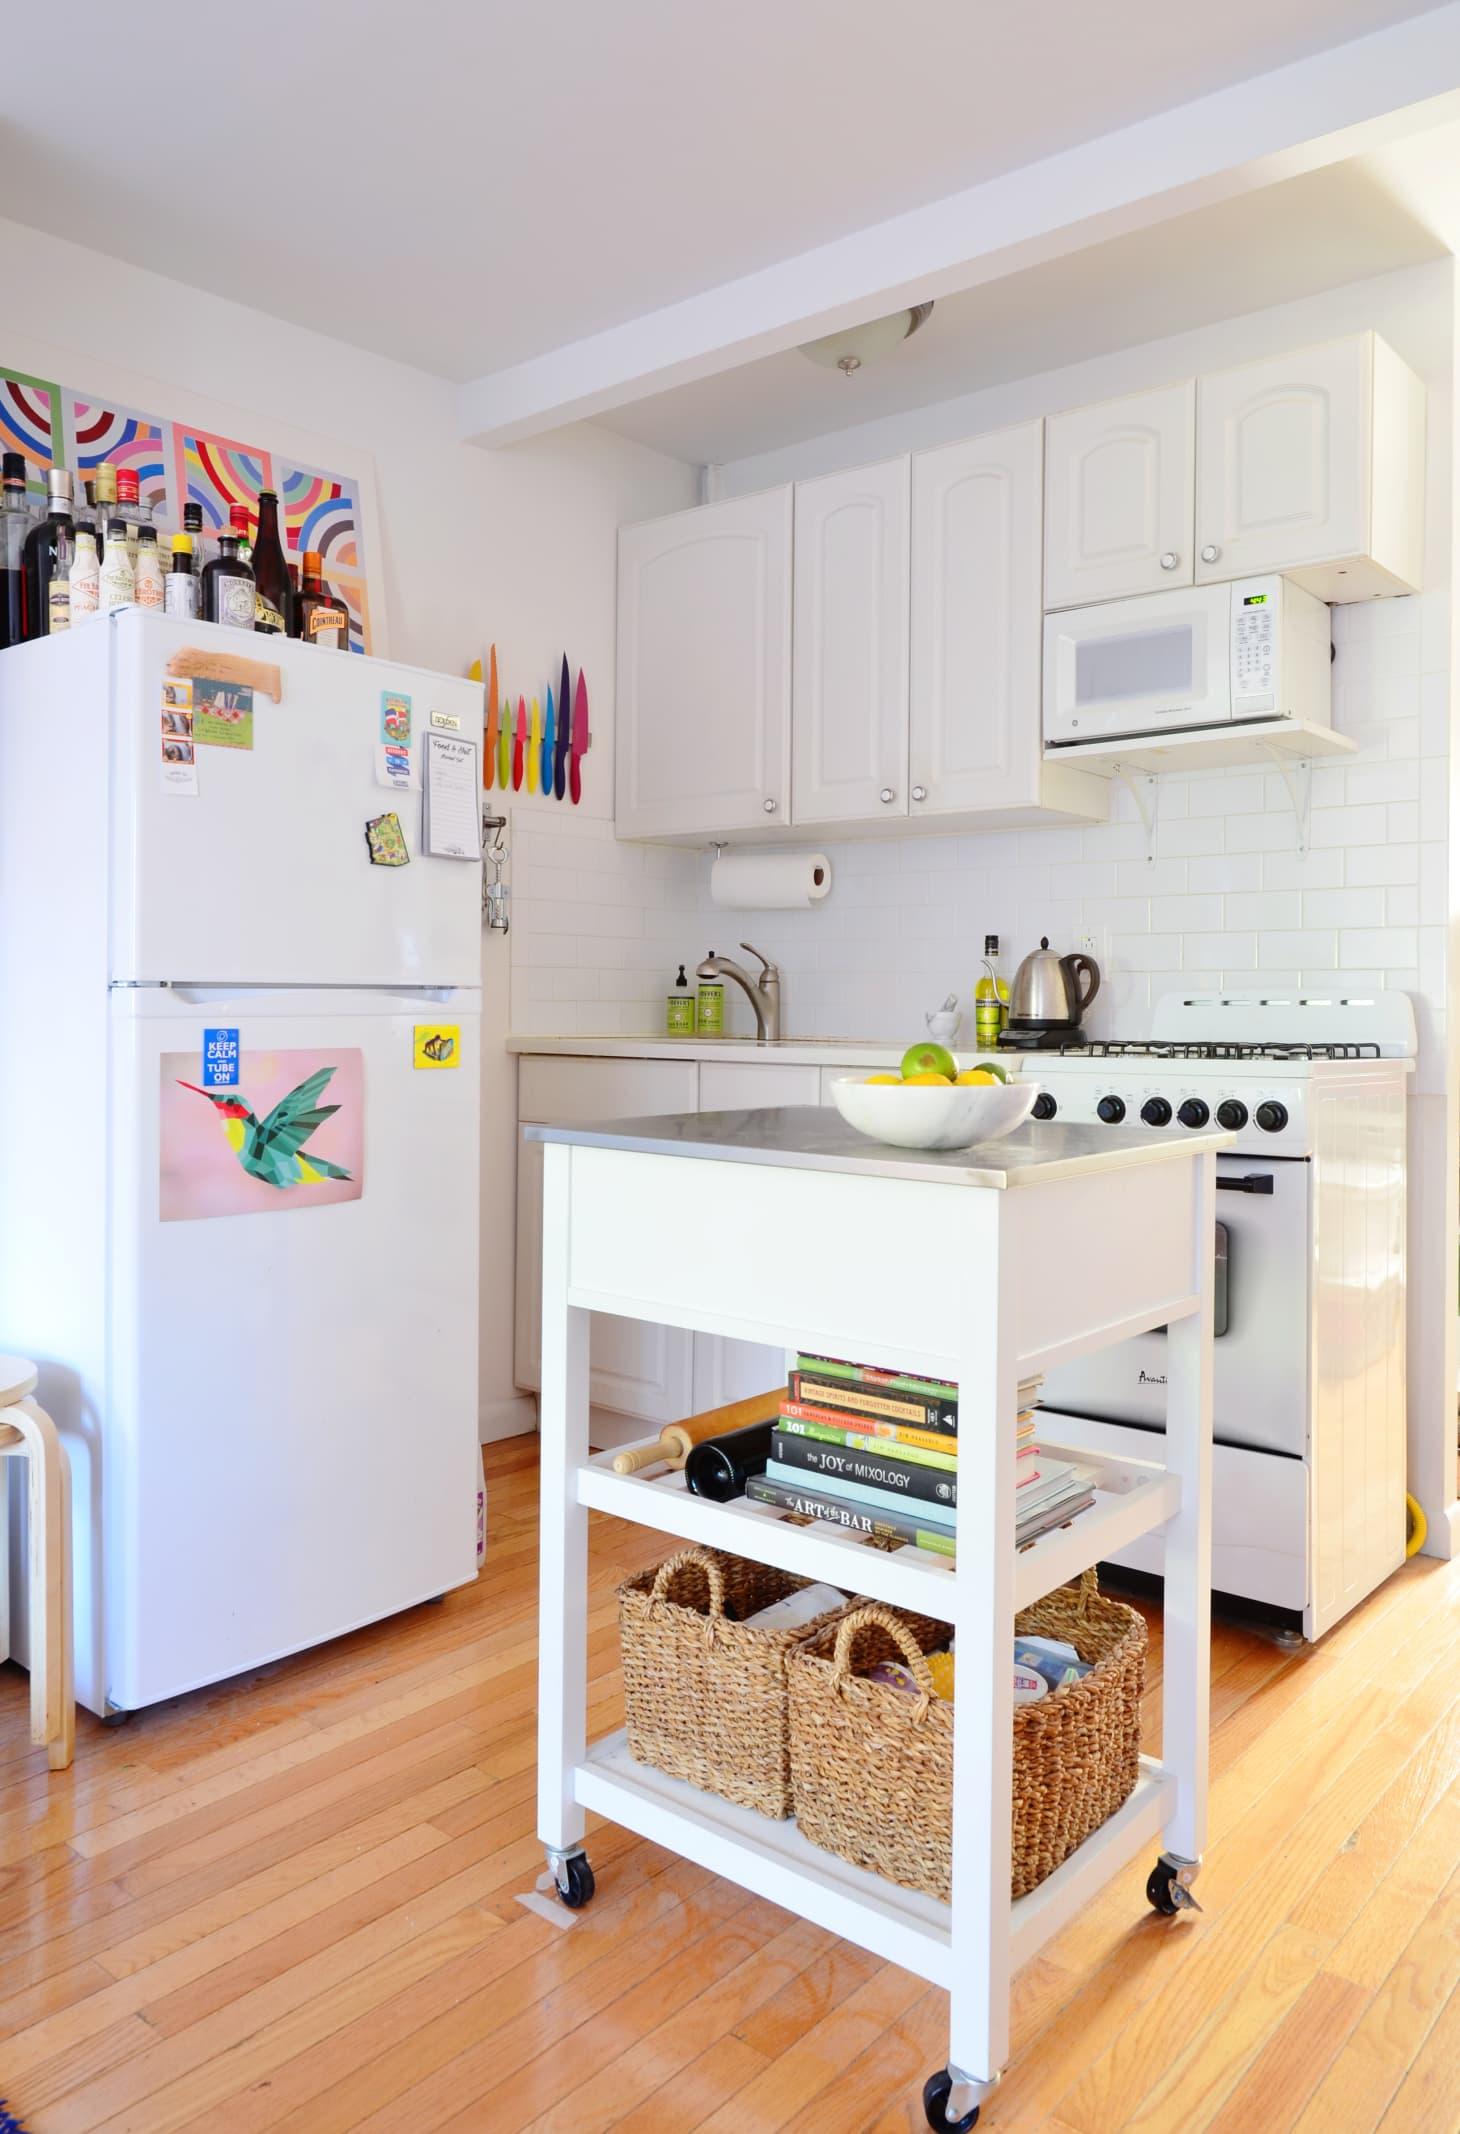 https:%2F%2Fstorage.googleapis.com%2Fgen atmedia%2F2%2F2017%2F12%2Fe8d009703d3c642da03927b60618dbb581888f5b - Download Simple Low Budget Small House Simple Kitchen Showcase Design Images